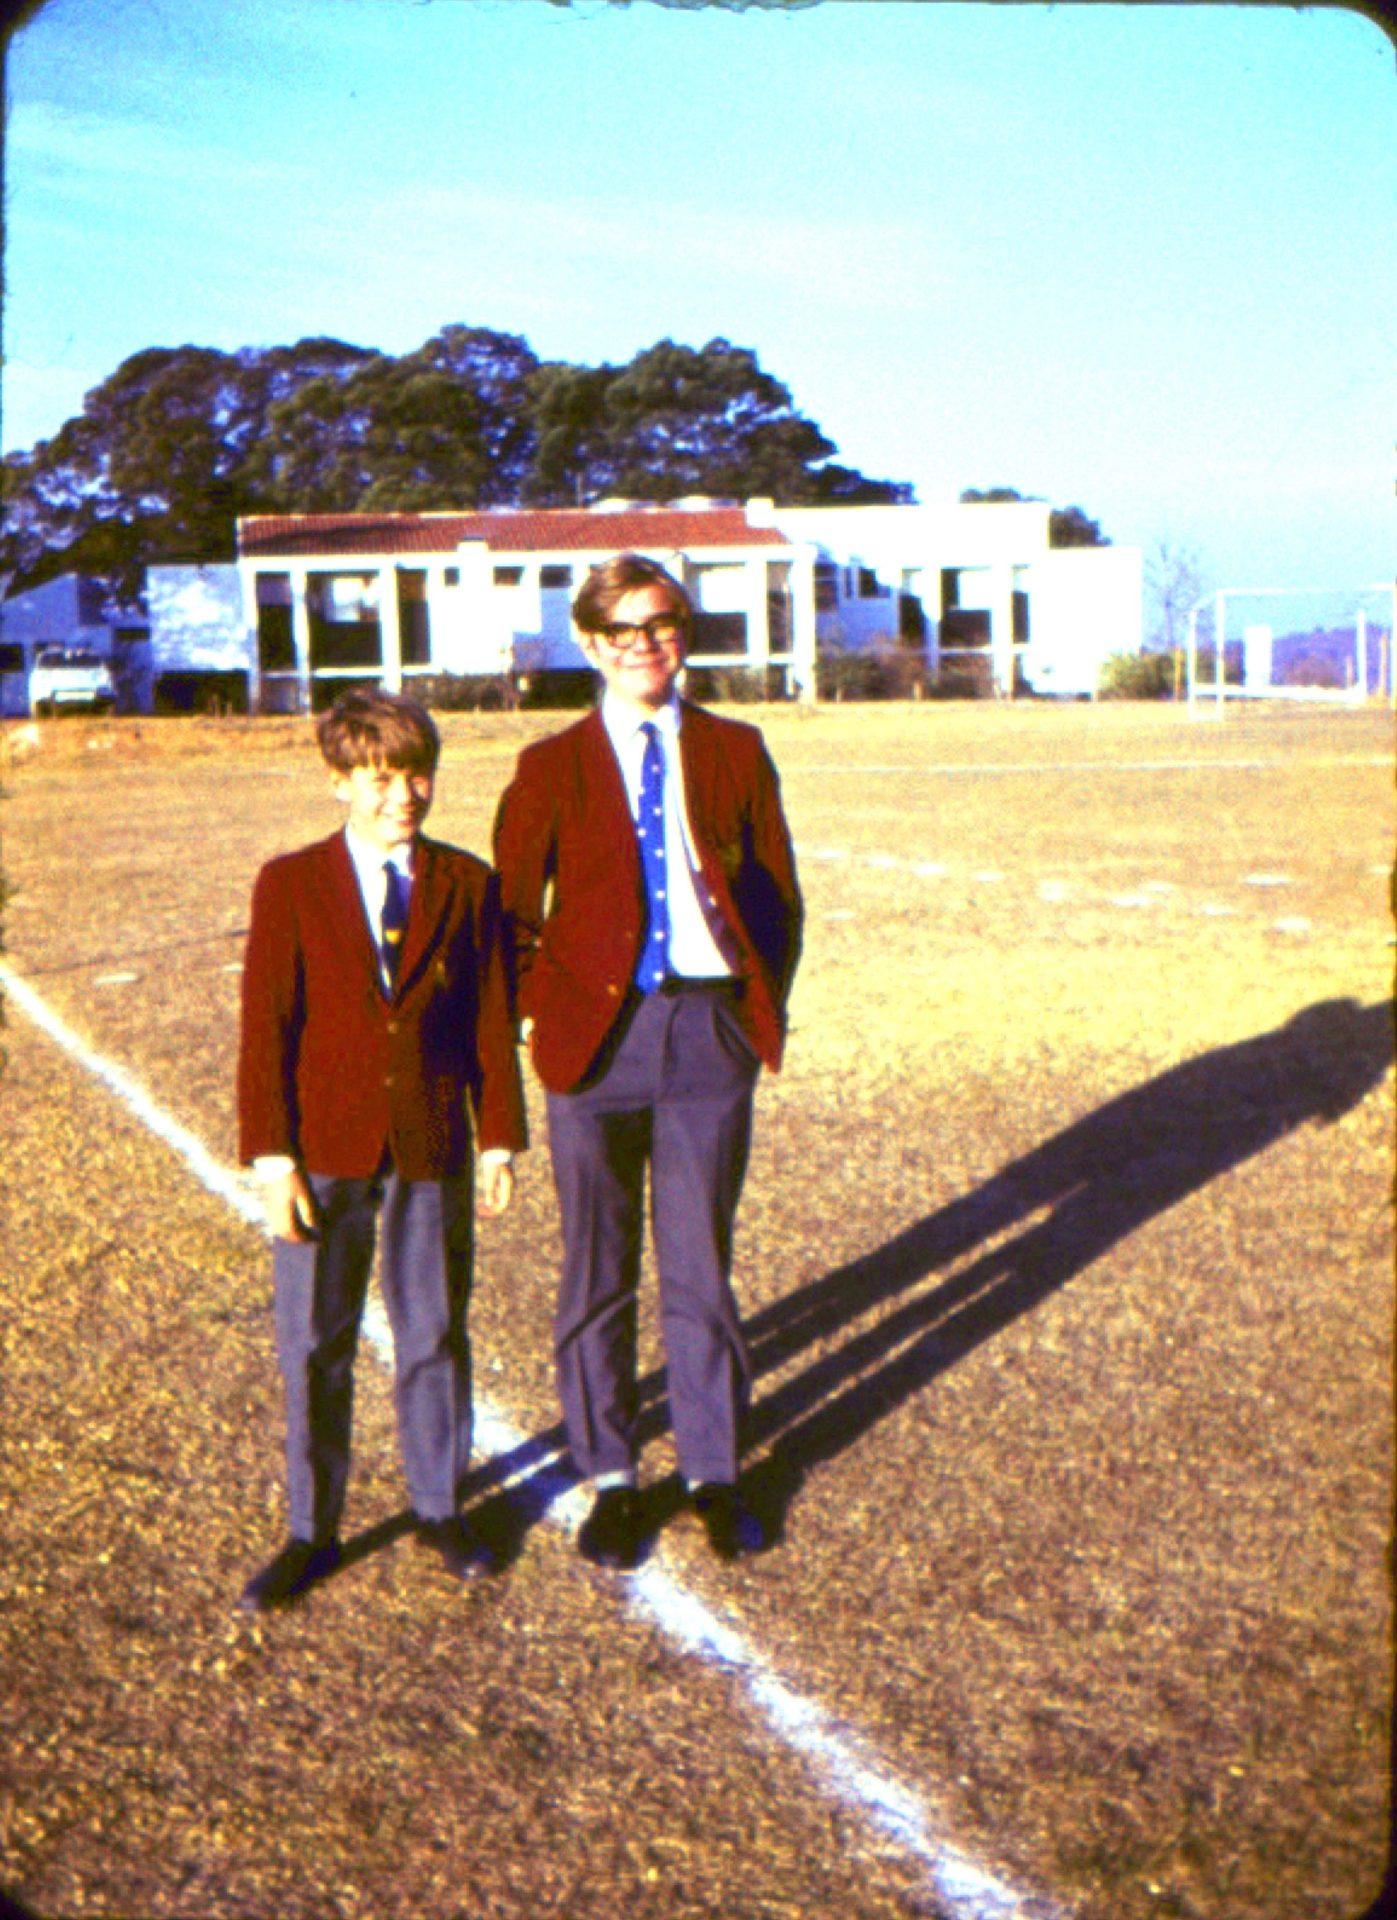 Robert Pimm and Stephen Turner